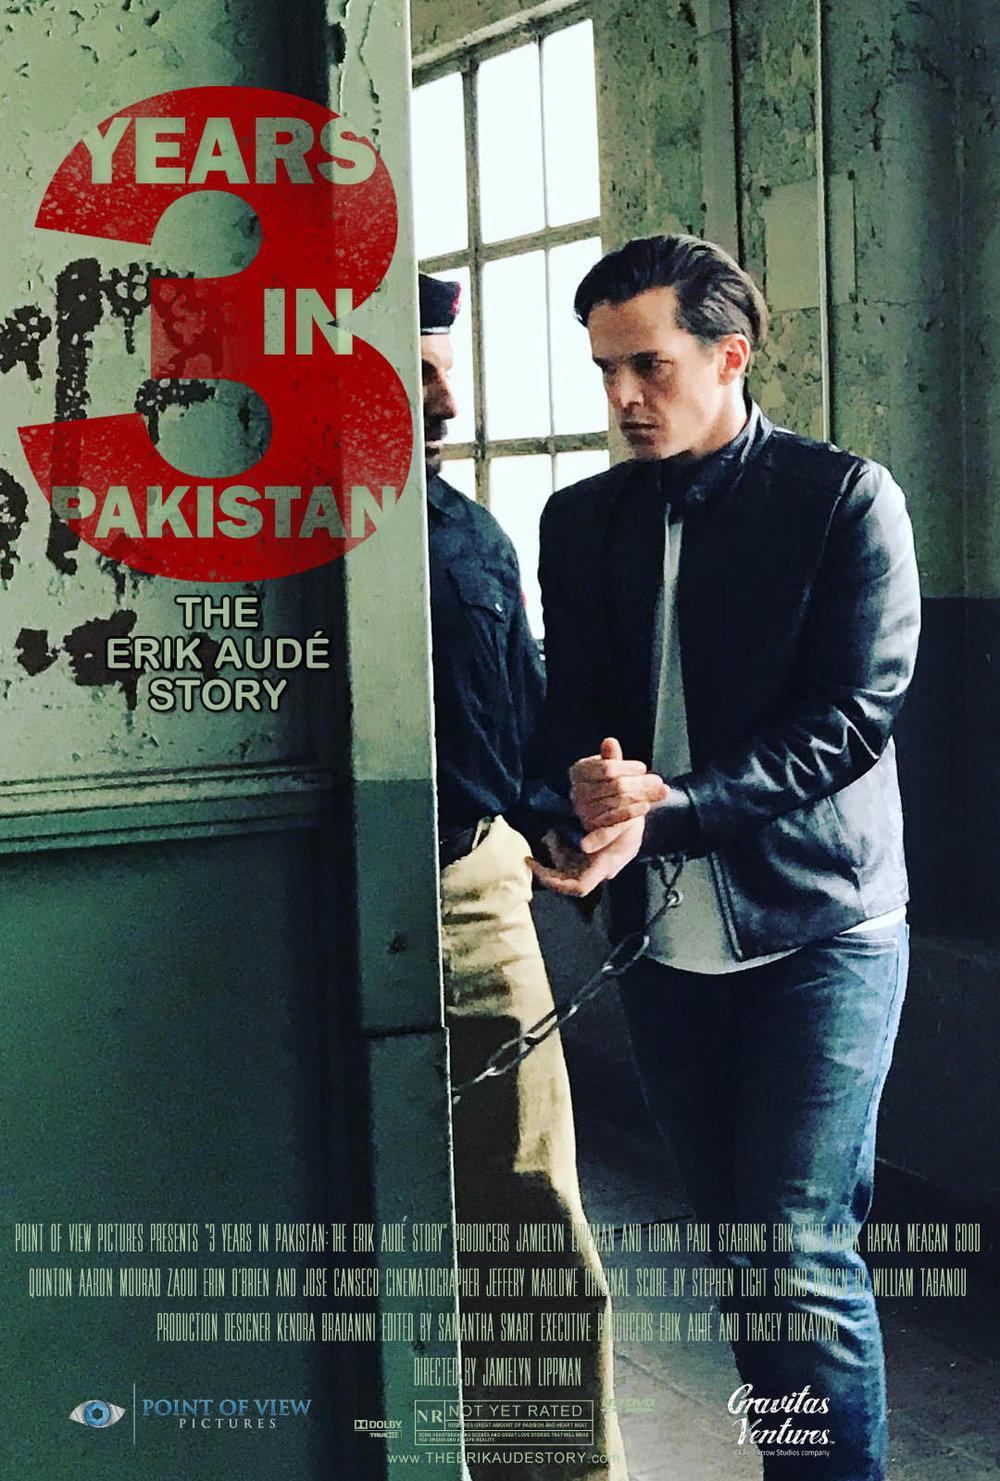 3 years in pakistan.jpg